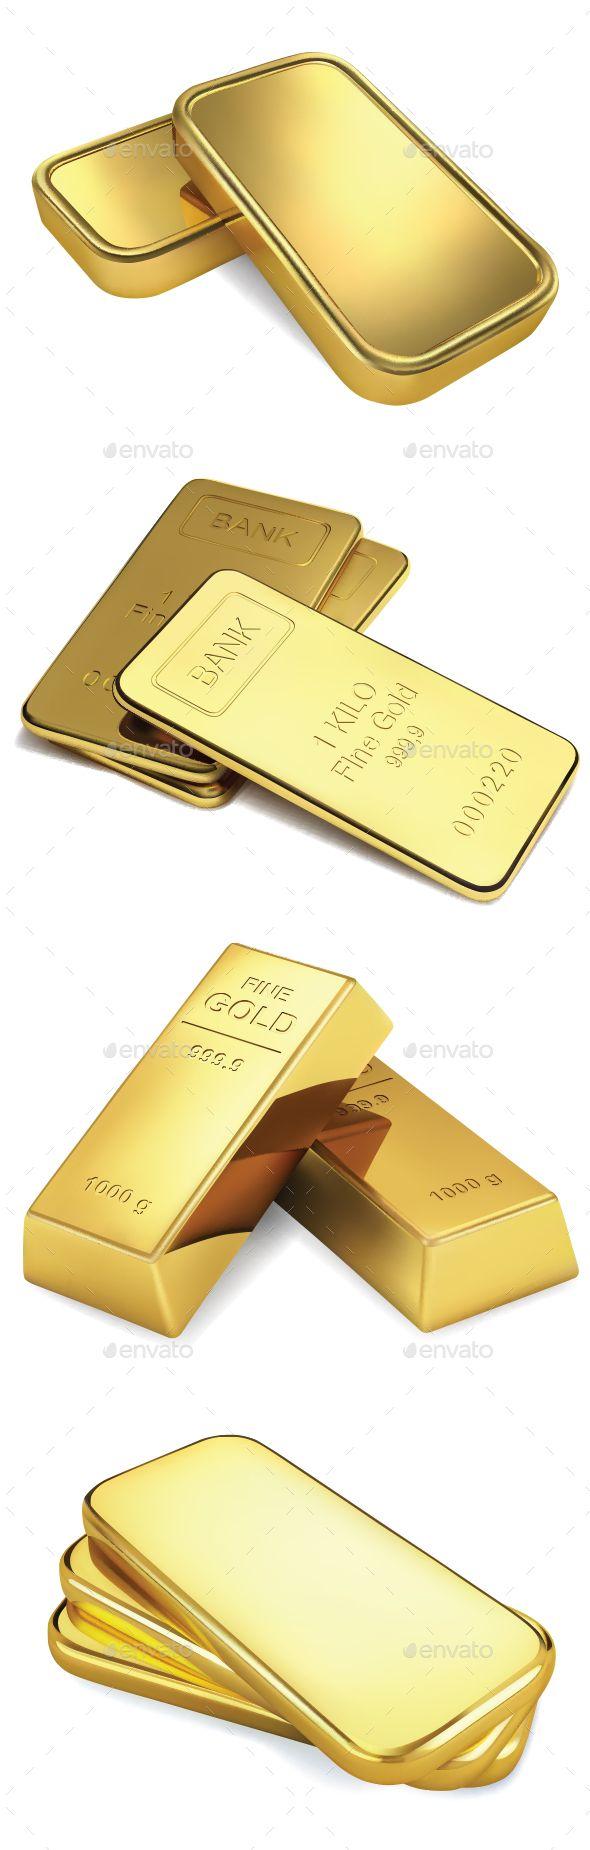 Gold Bars Vector Character Design Gold Bar Graphics Inspiration